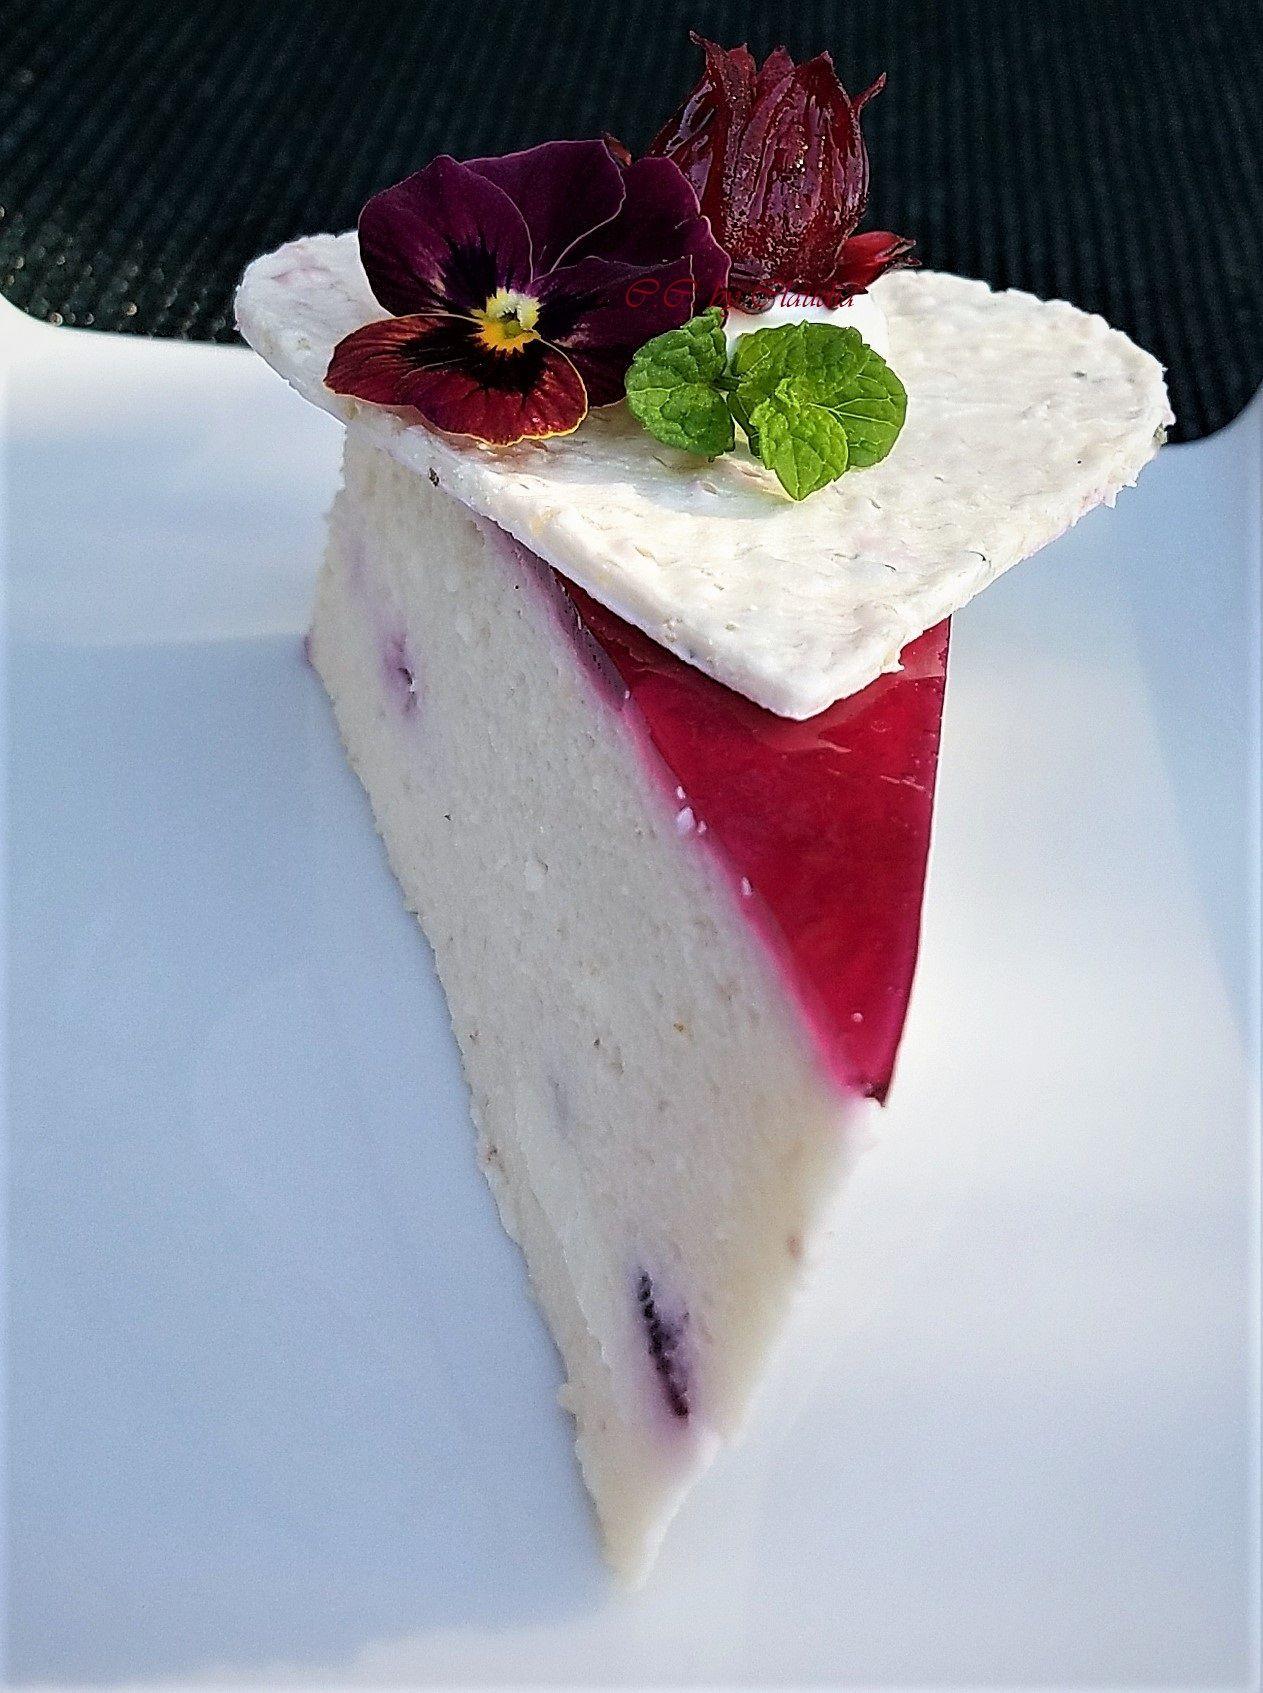 Lychee cheesecake with homemade hibiscus flowers in rose syrup lychee cheesecake with homemade hibiscus flowers in rose syrup izmirmasajfo